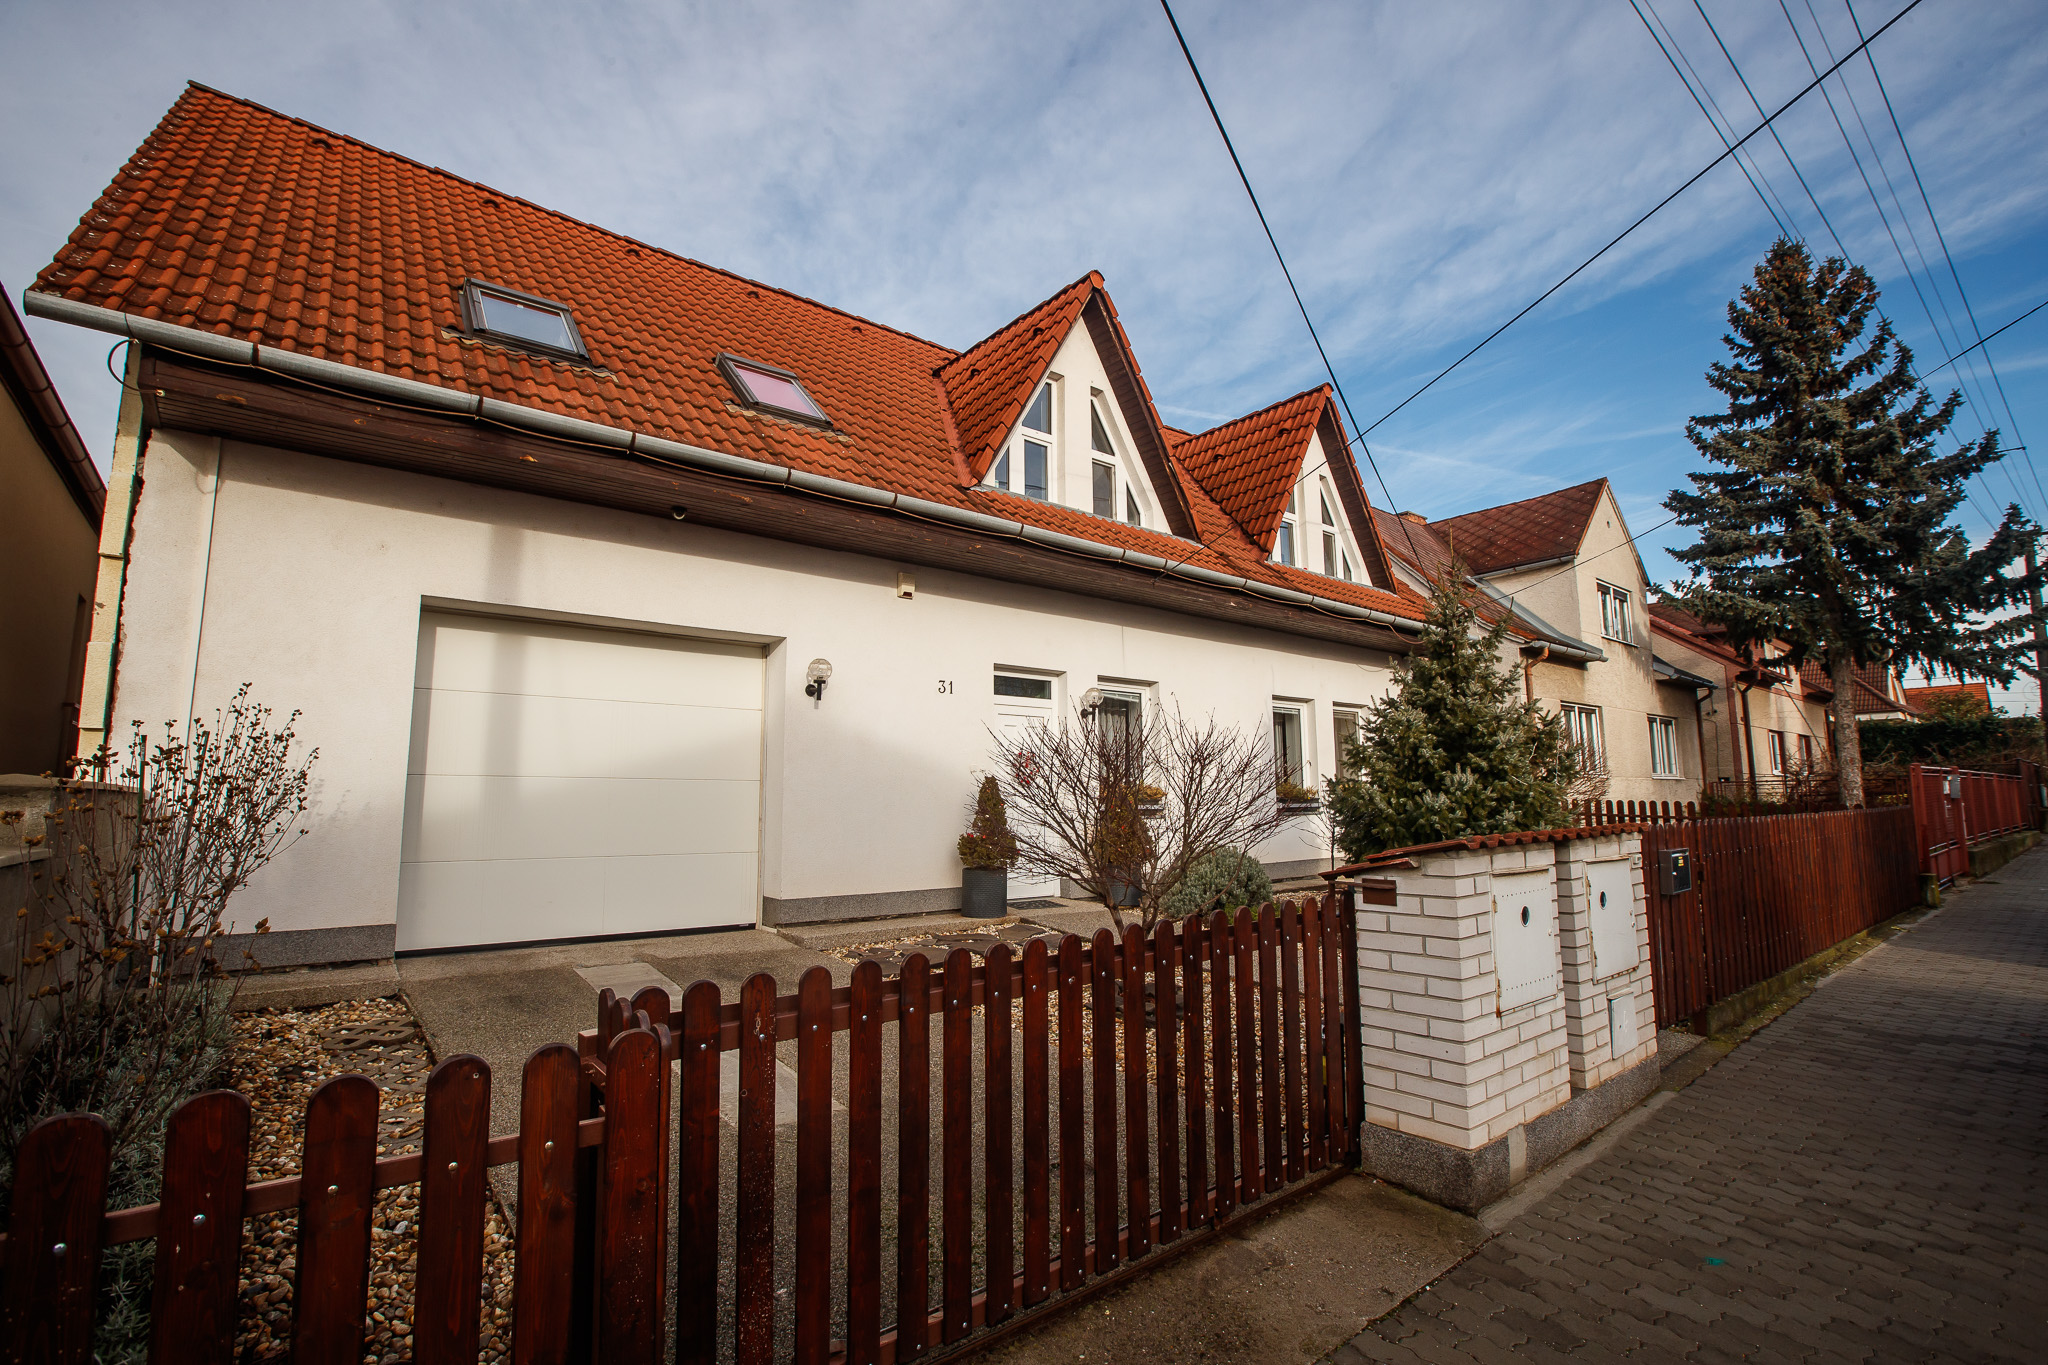 Dom - 7 izbový, 280 m2 - Bratislava IV, Devínska Nová Ves, Mečíkova